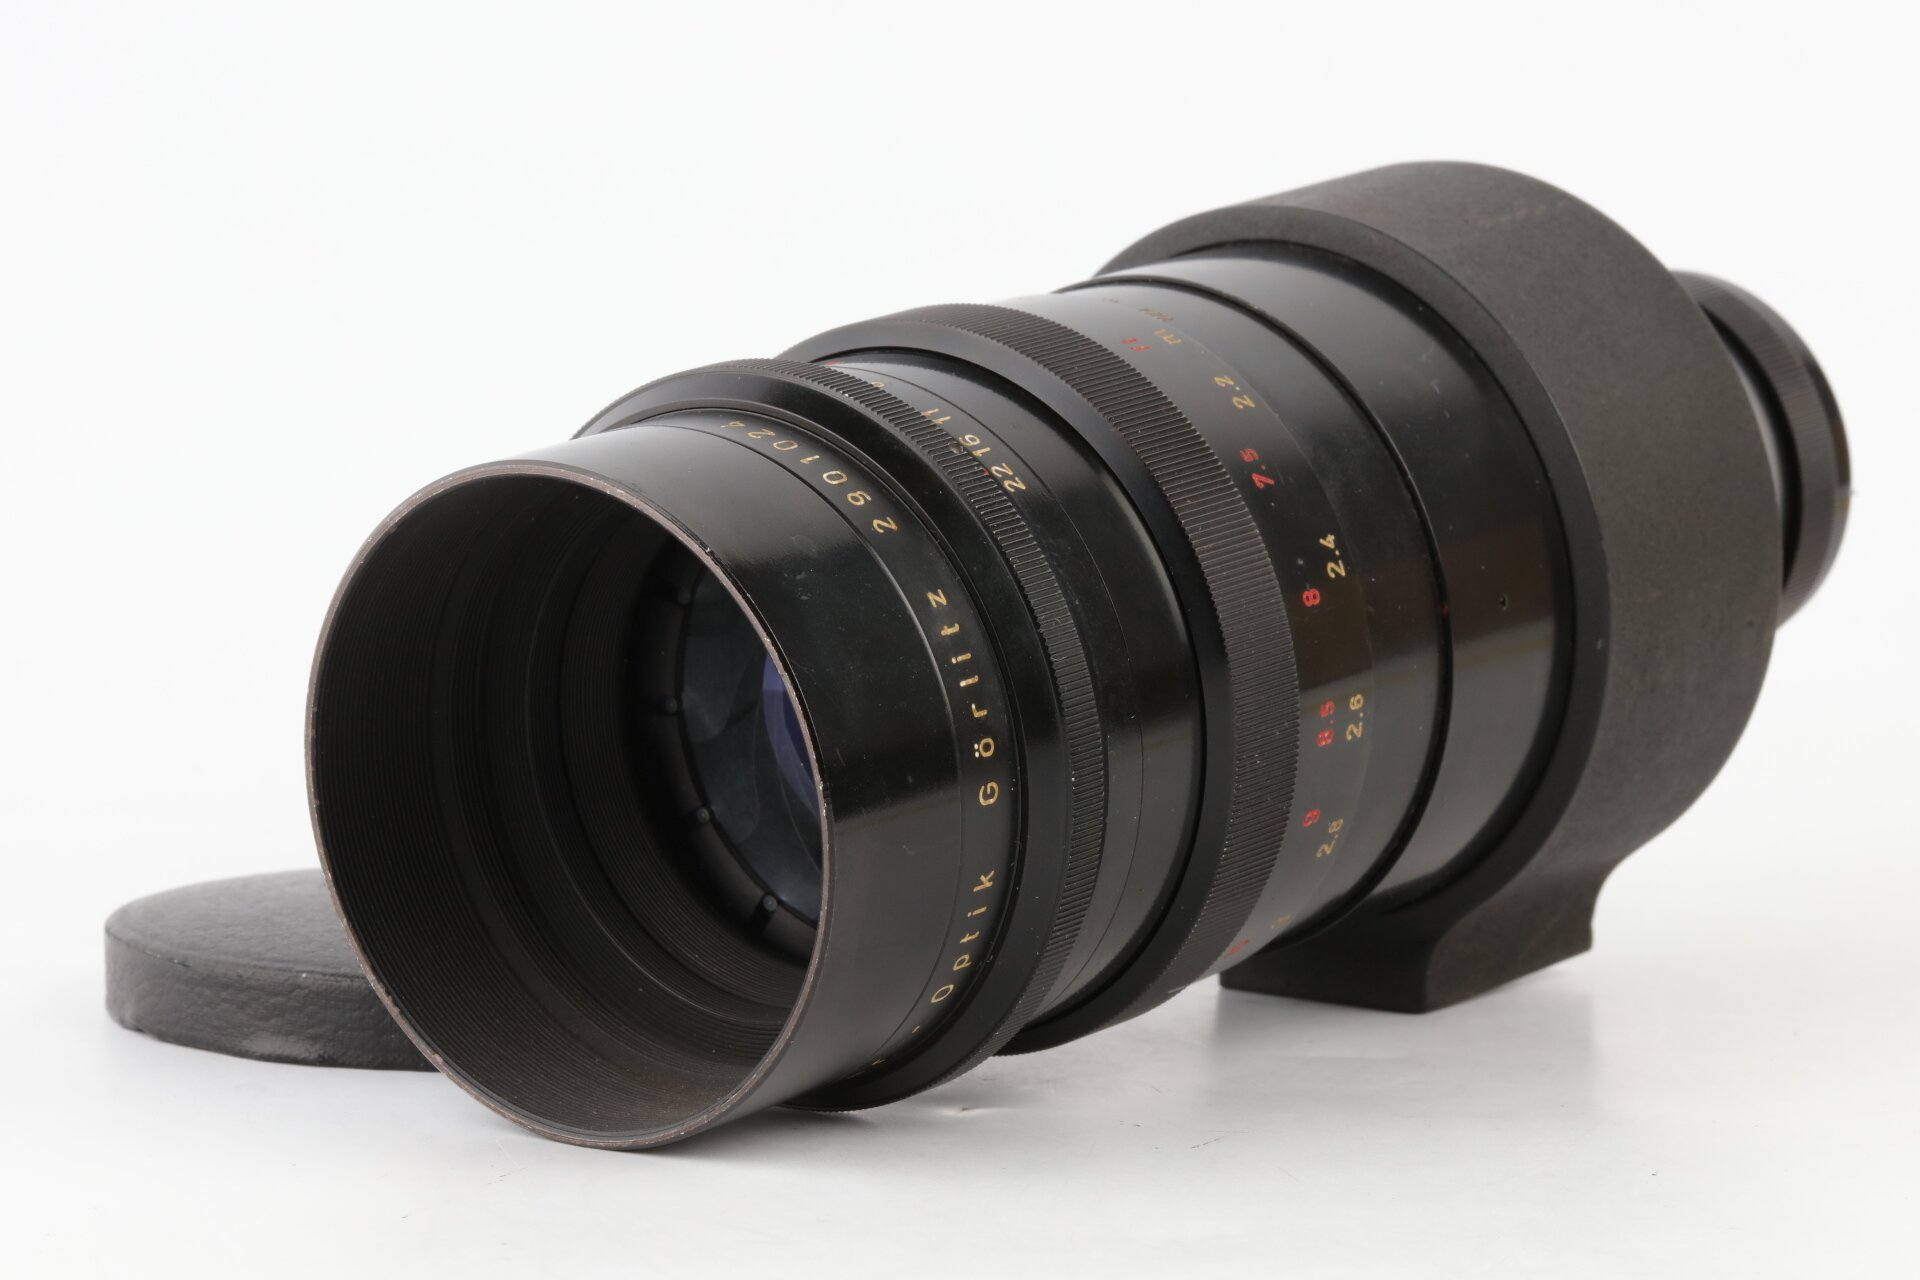 Meyer-Optik Primotar 3,5/180mm M42